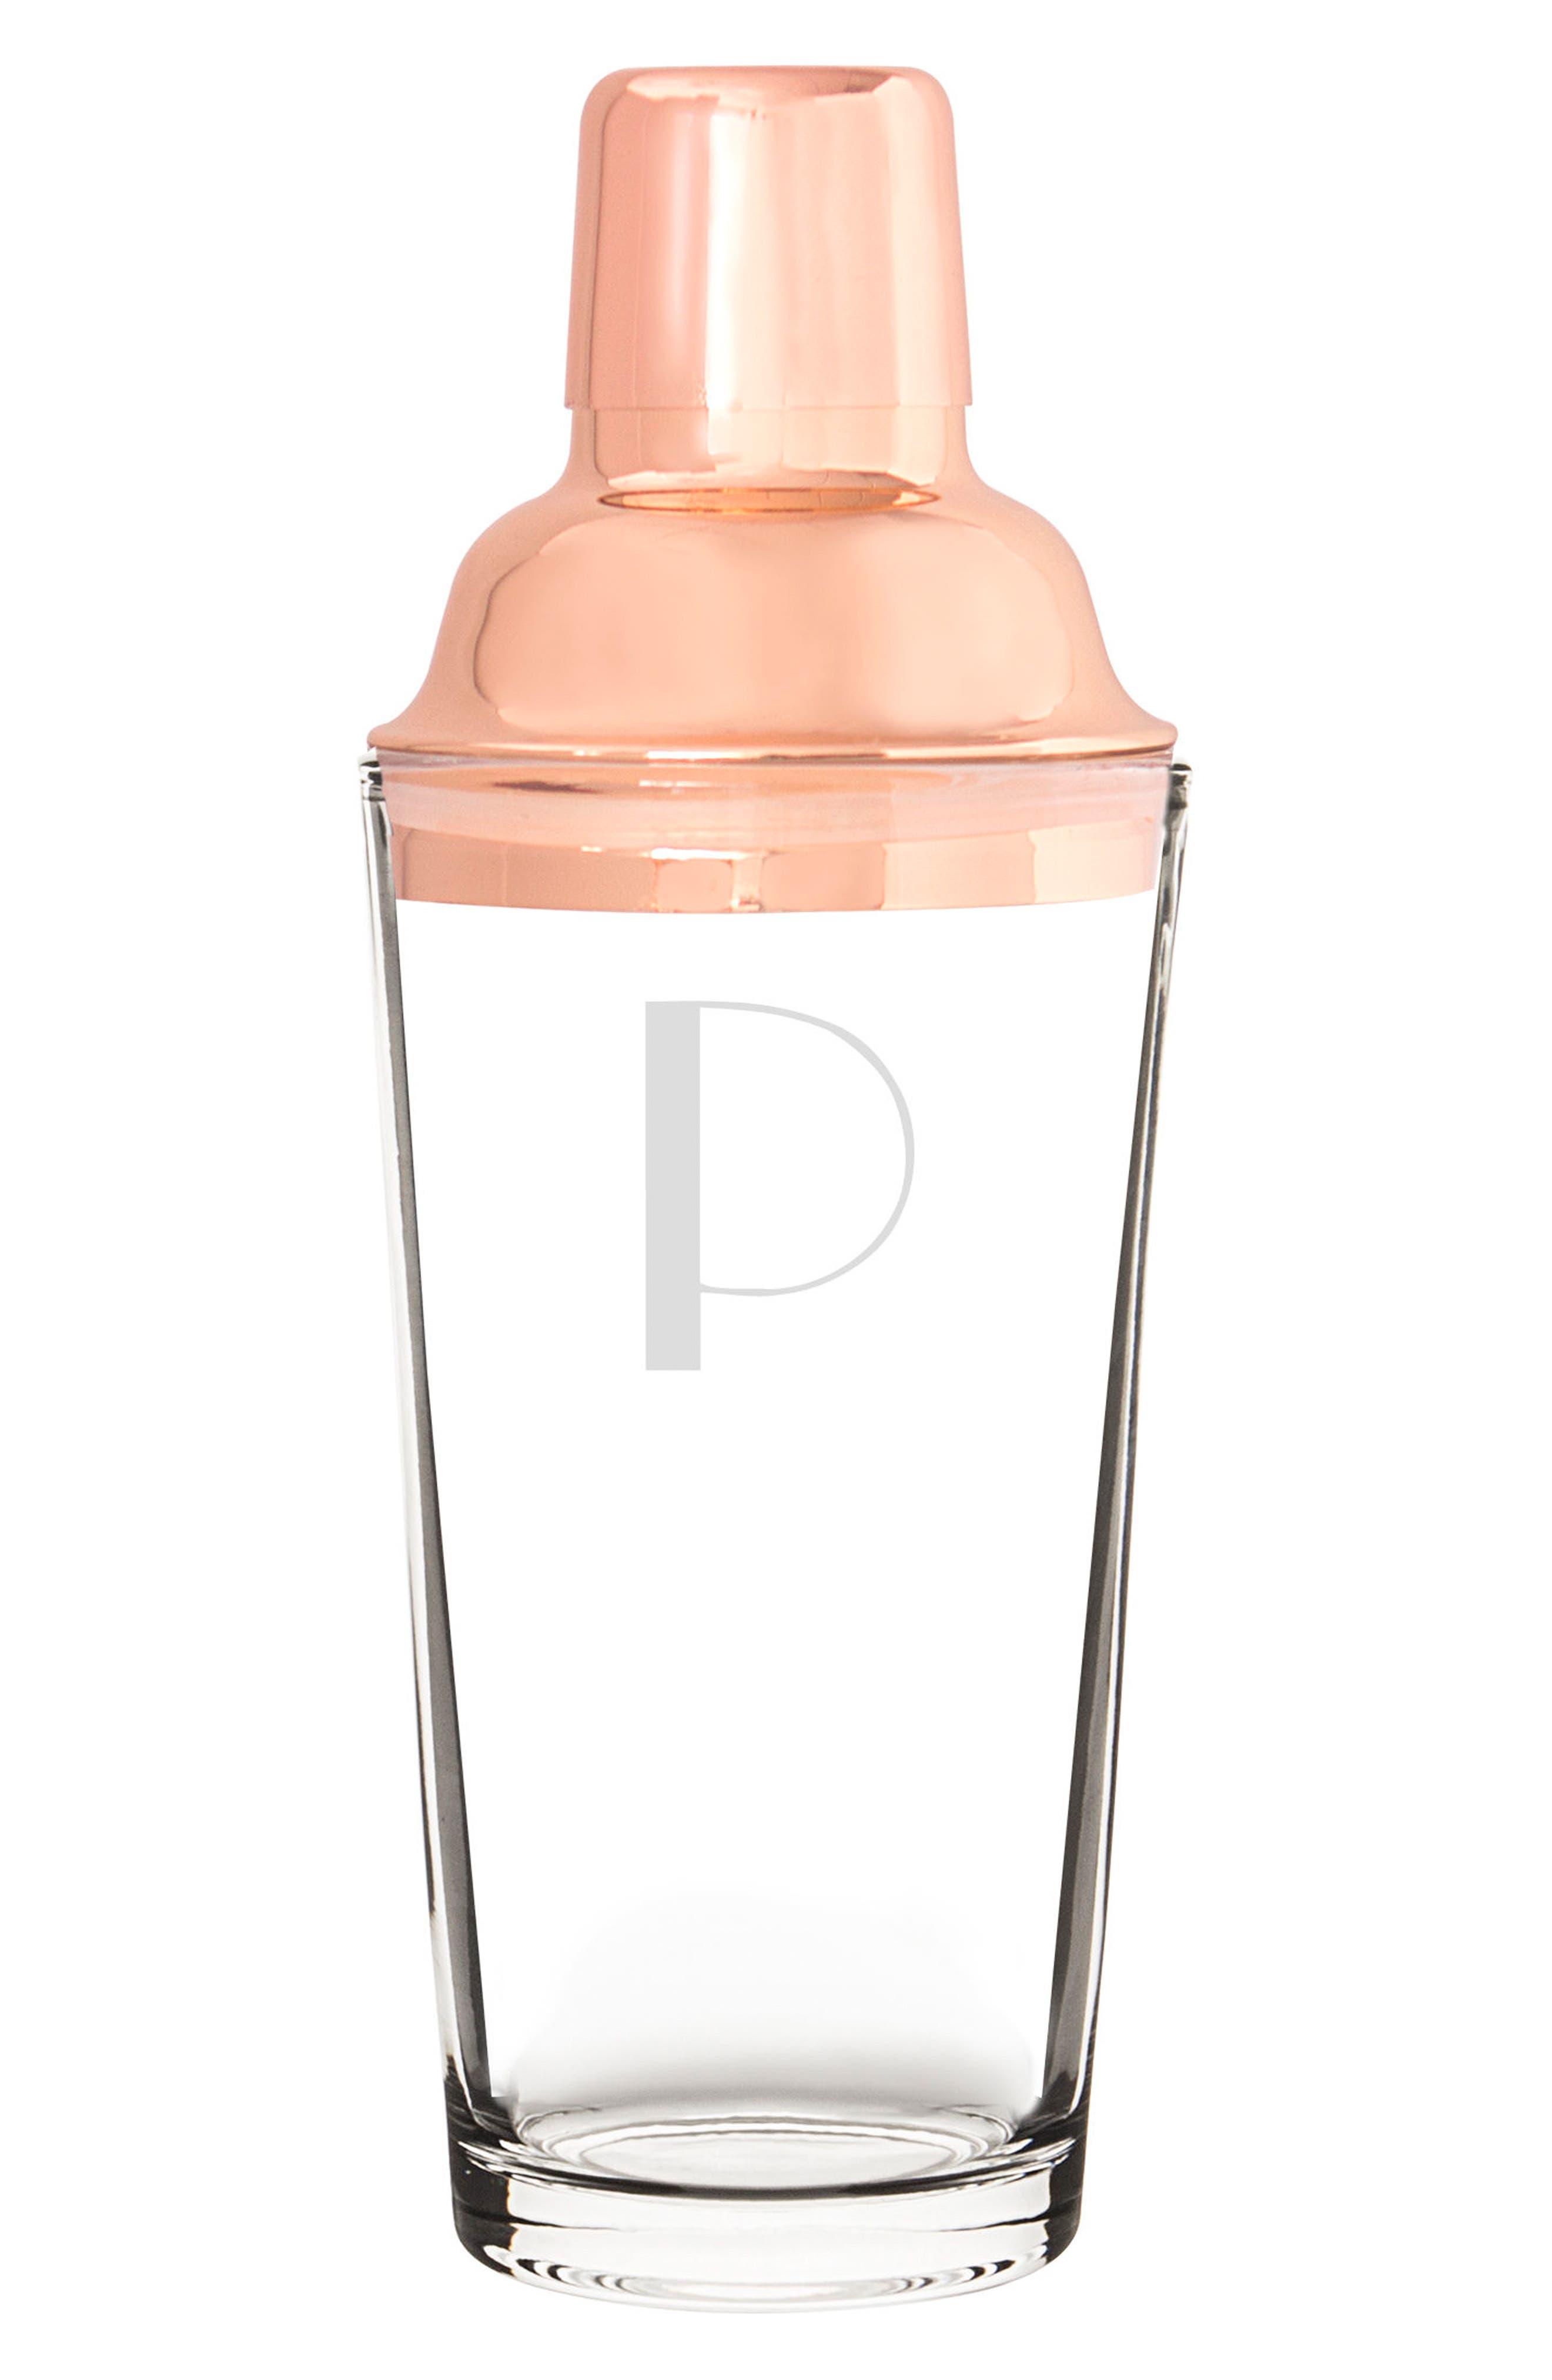 Monogram Coppertone Cocktail Shaker,                             Main thumbnail 17, color,